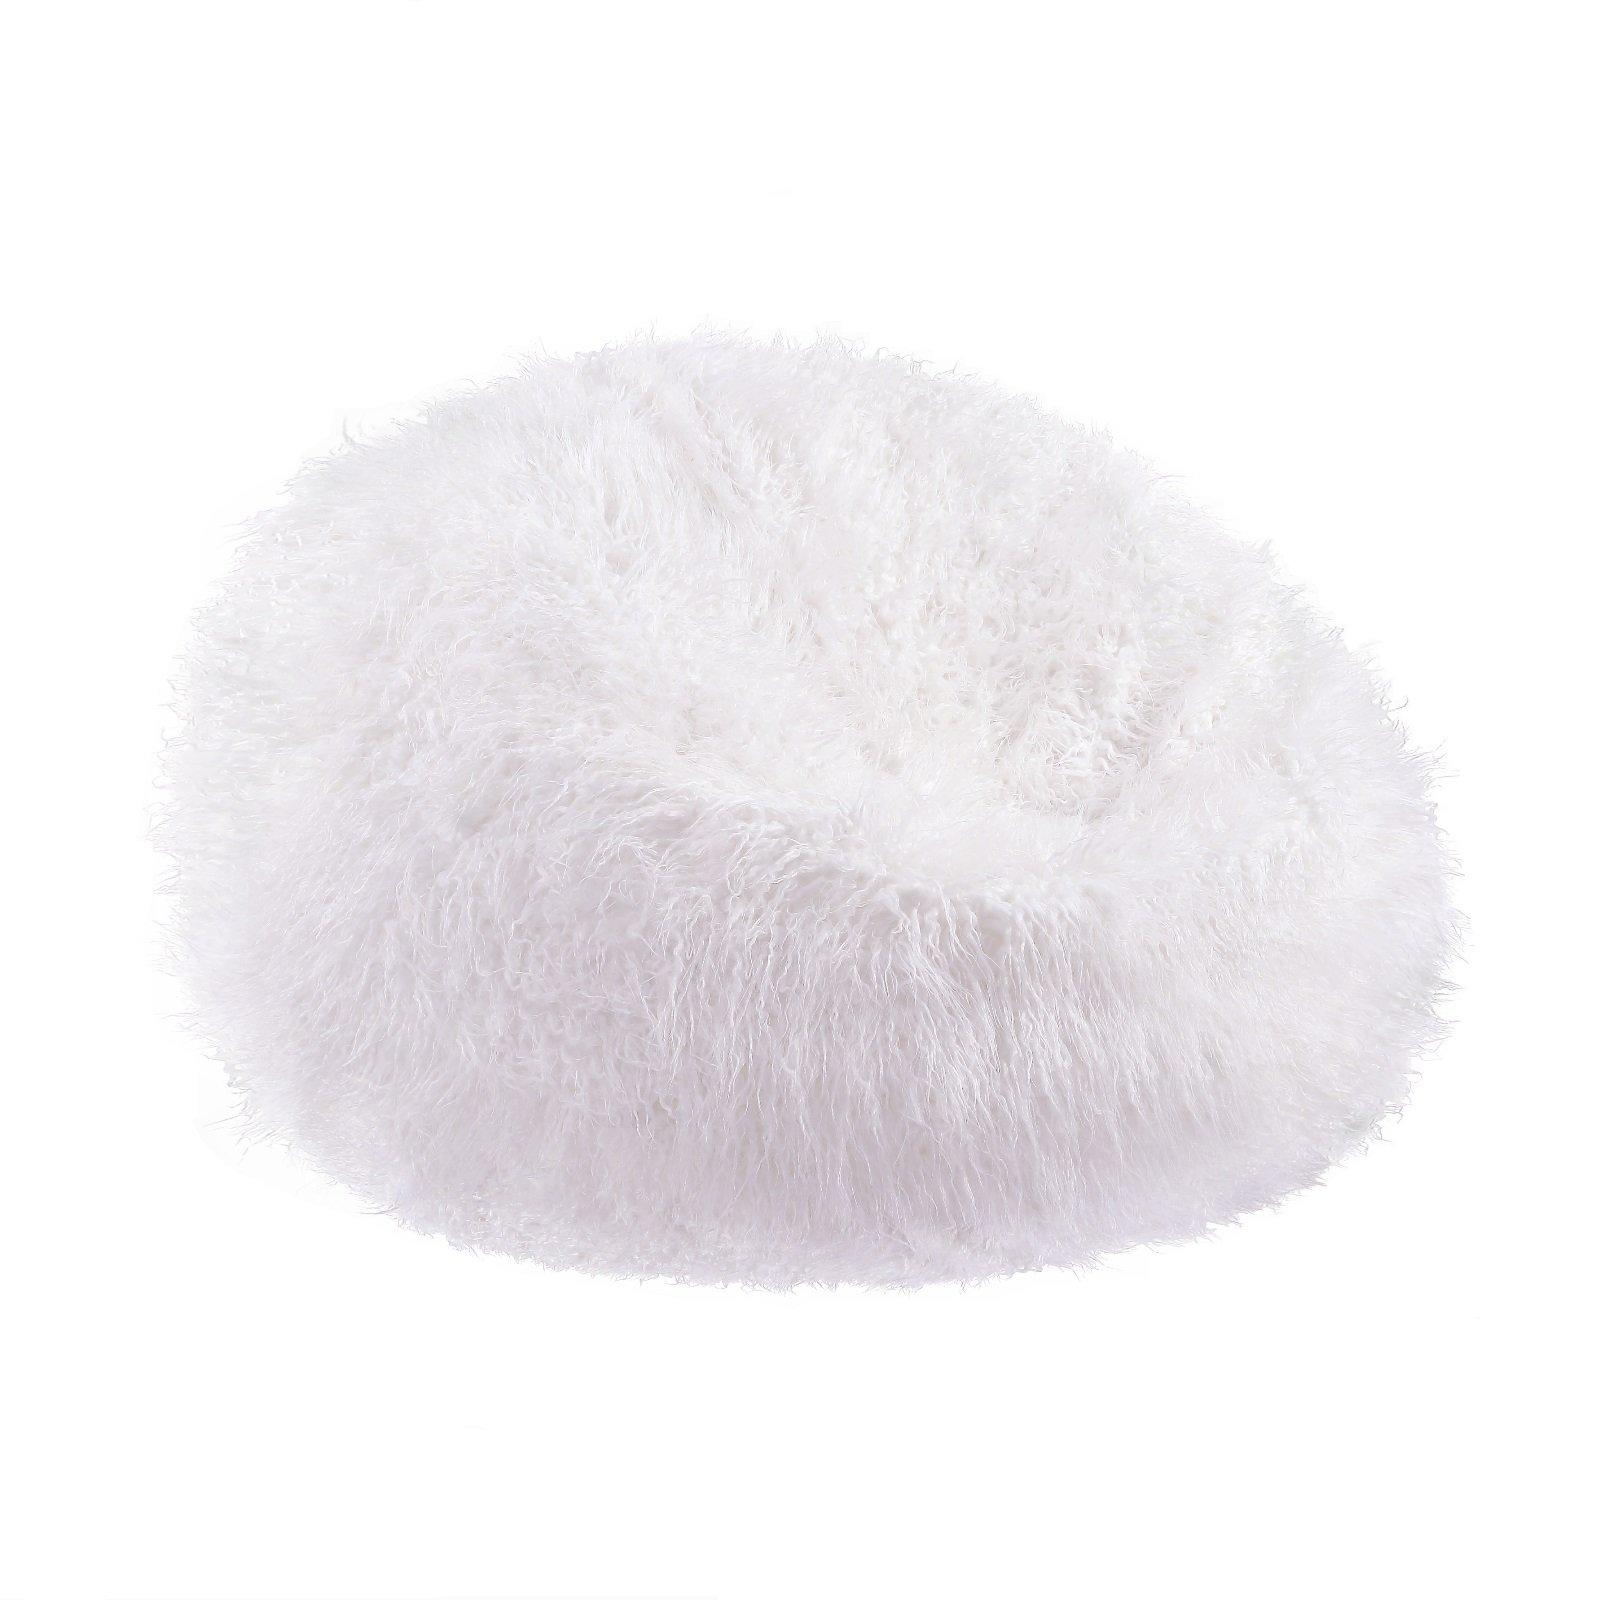 Tremendous Buy Acanva Large Plush Faux Fur Teardrop Slacker Bean Bag Creativecarmelina Interior Chair Design Creativecarmelinacom